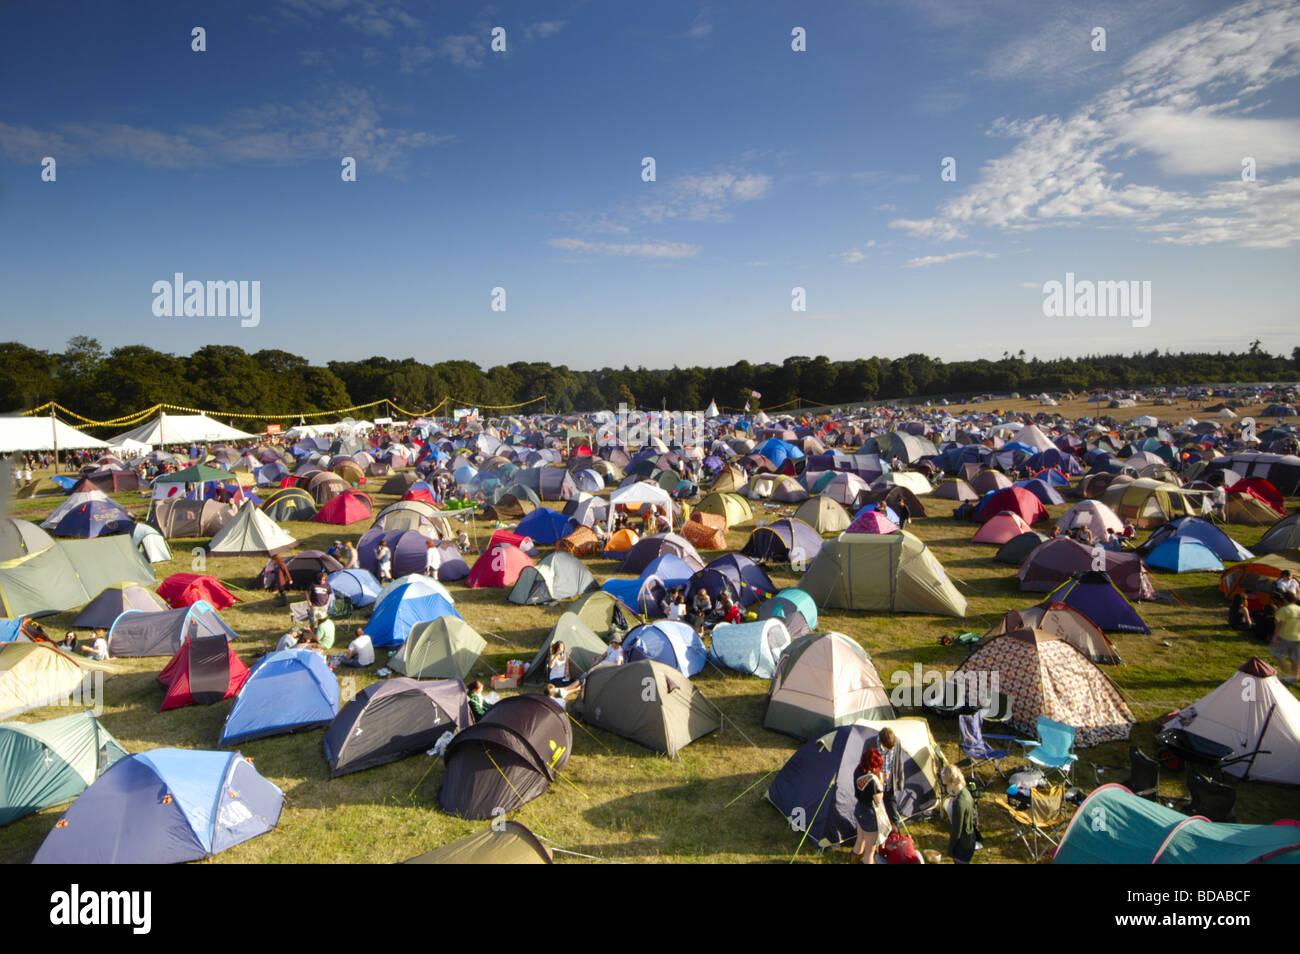 Camping principal Latitud Music Festival, Southwold, Suffolk, Reino Unido Imagen De Stock